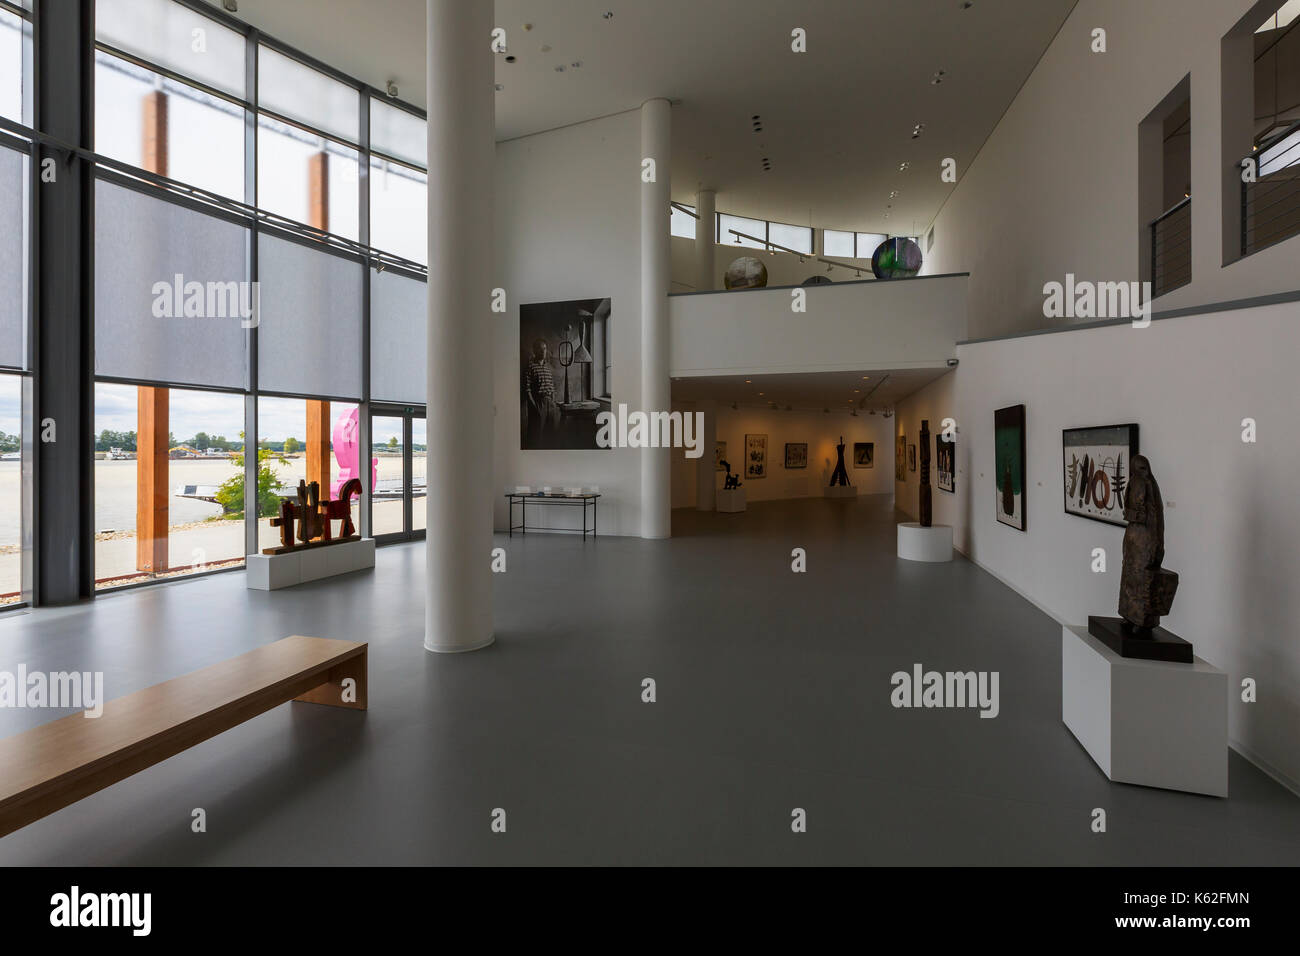 Exhibition spaces of Danubiana modern art gallery in Bratislava, Slovakia. - Stock Image